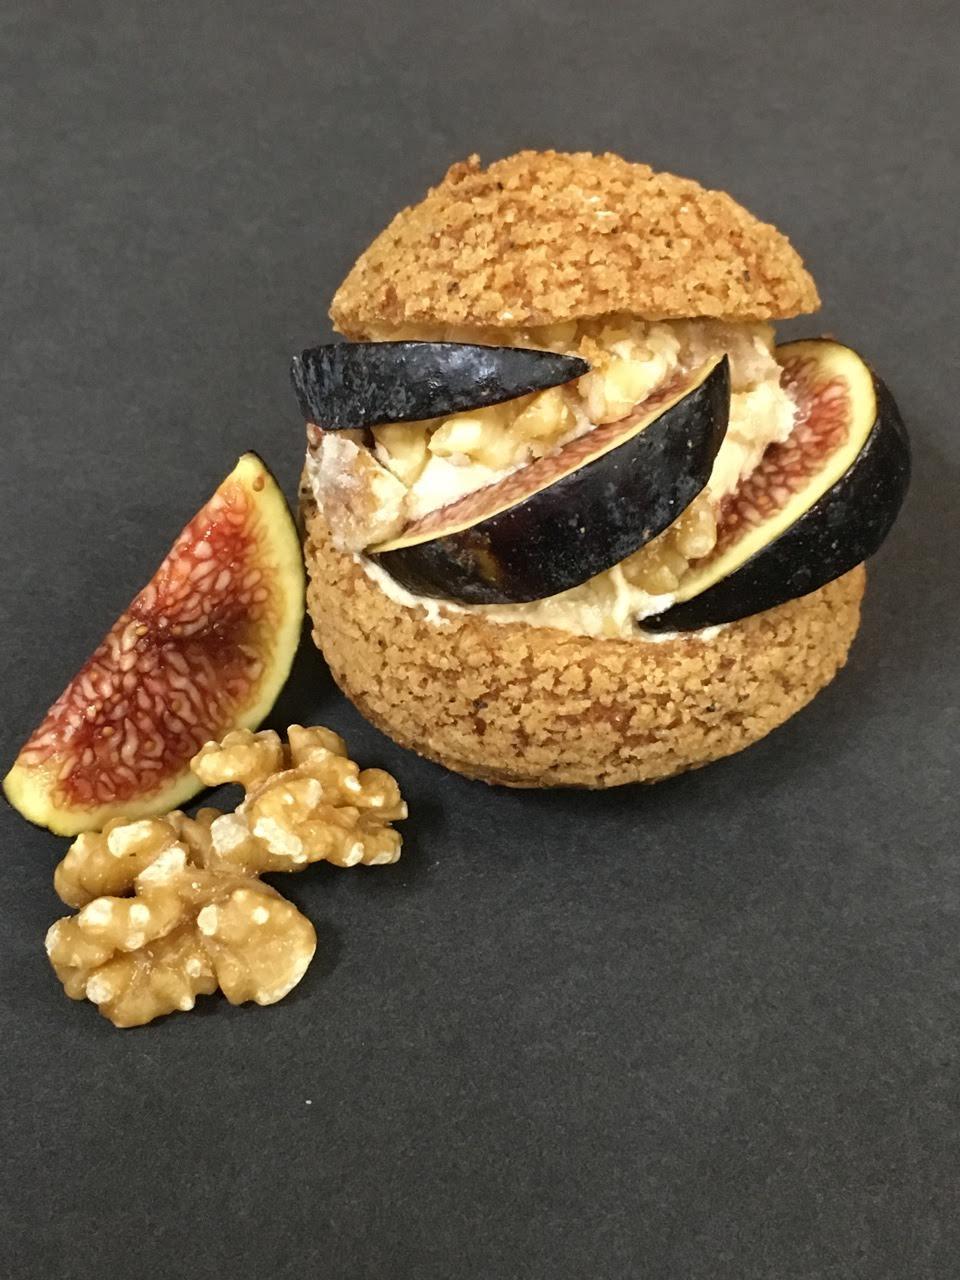 Fous_Desserts_Miel_Bonneau_2018.jpg